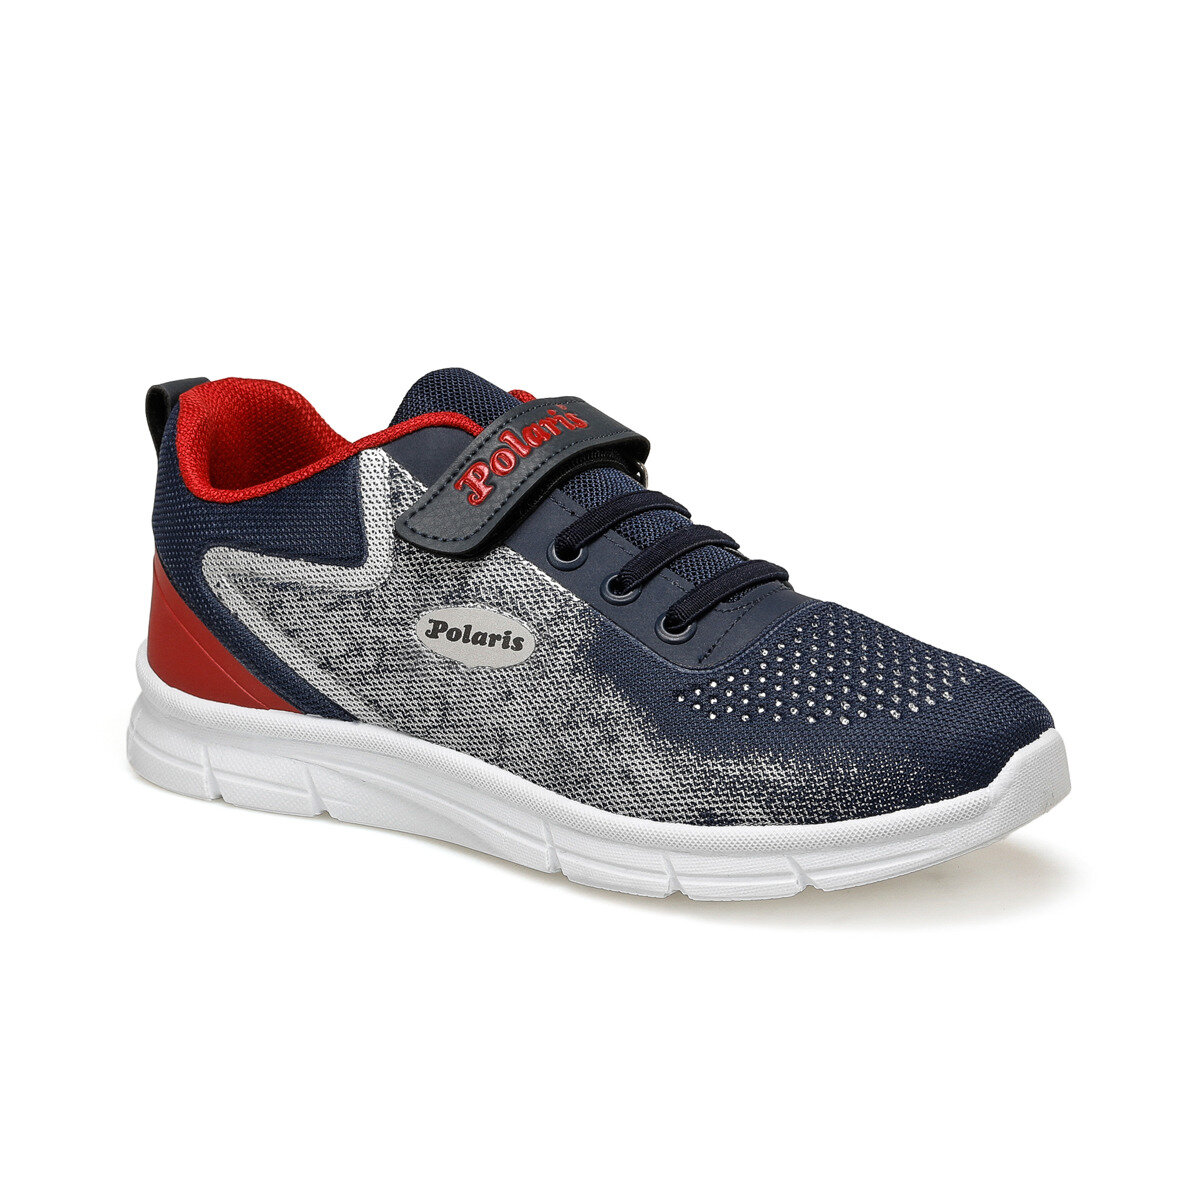 FLO 91.511206.G Navy Blue Male Child Sports Shoes Polaris